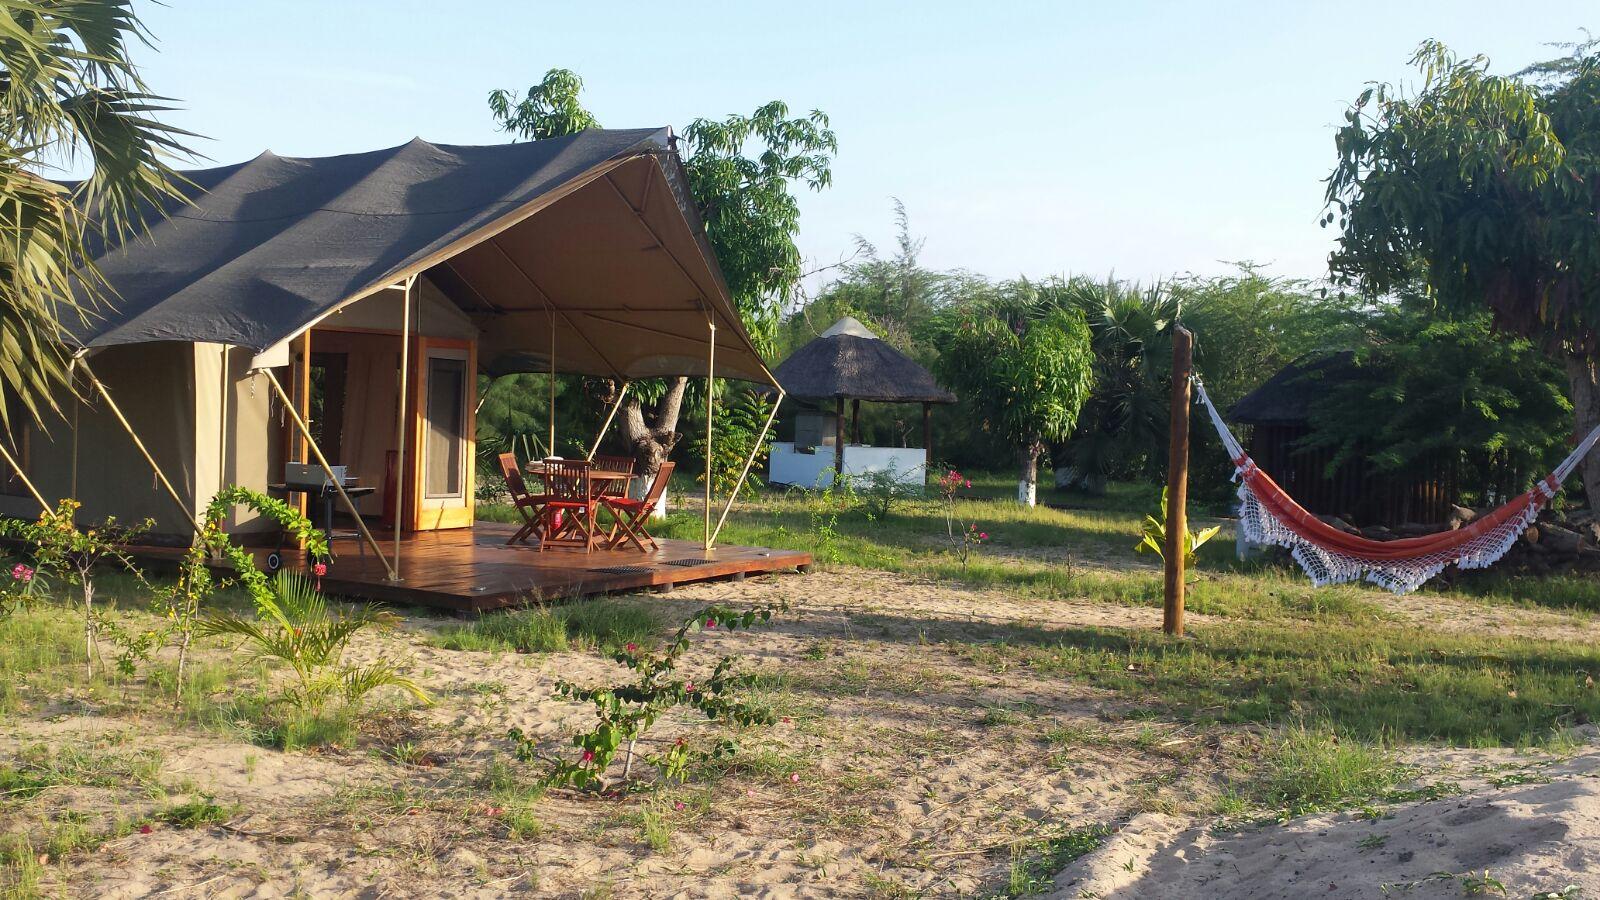 Mussulo Luxurious Safari Tent n°2 Tenten te Huur in Luanda